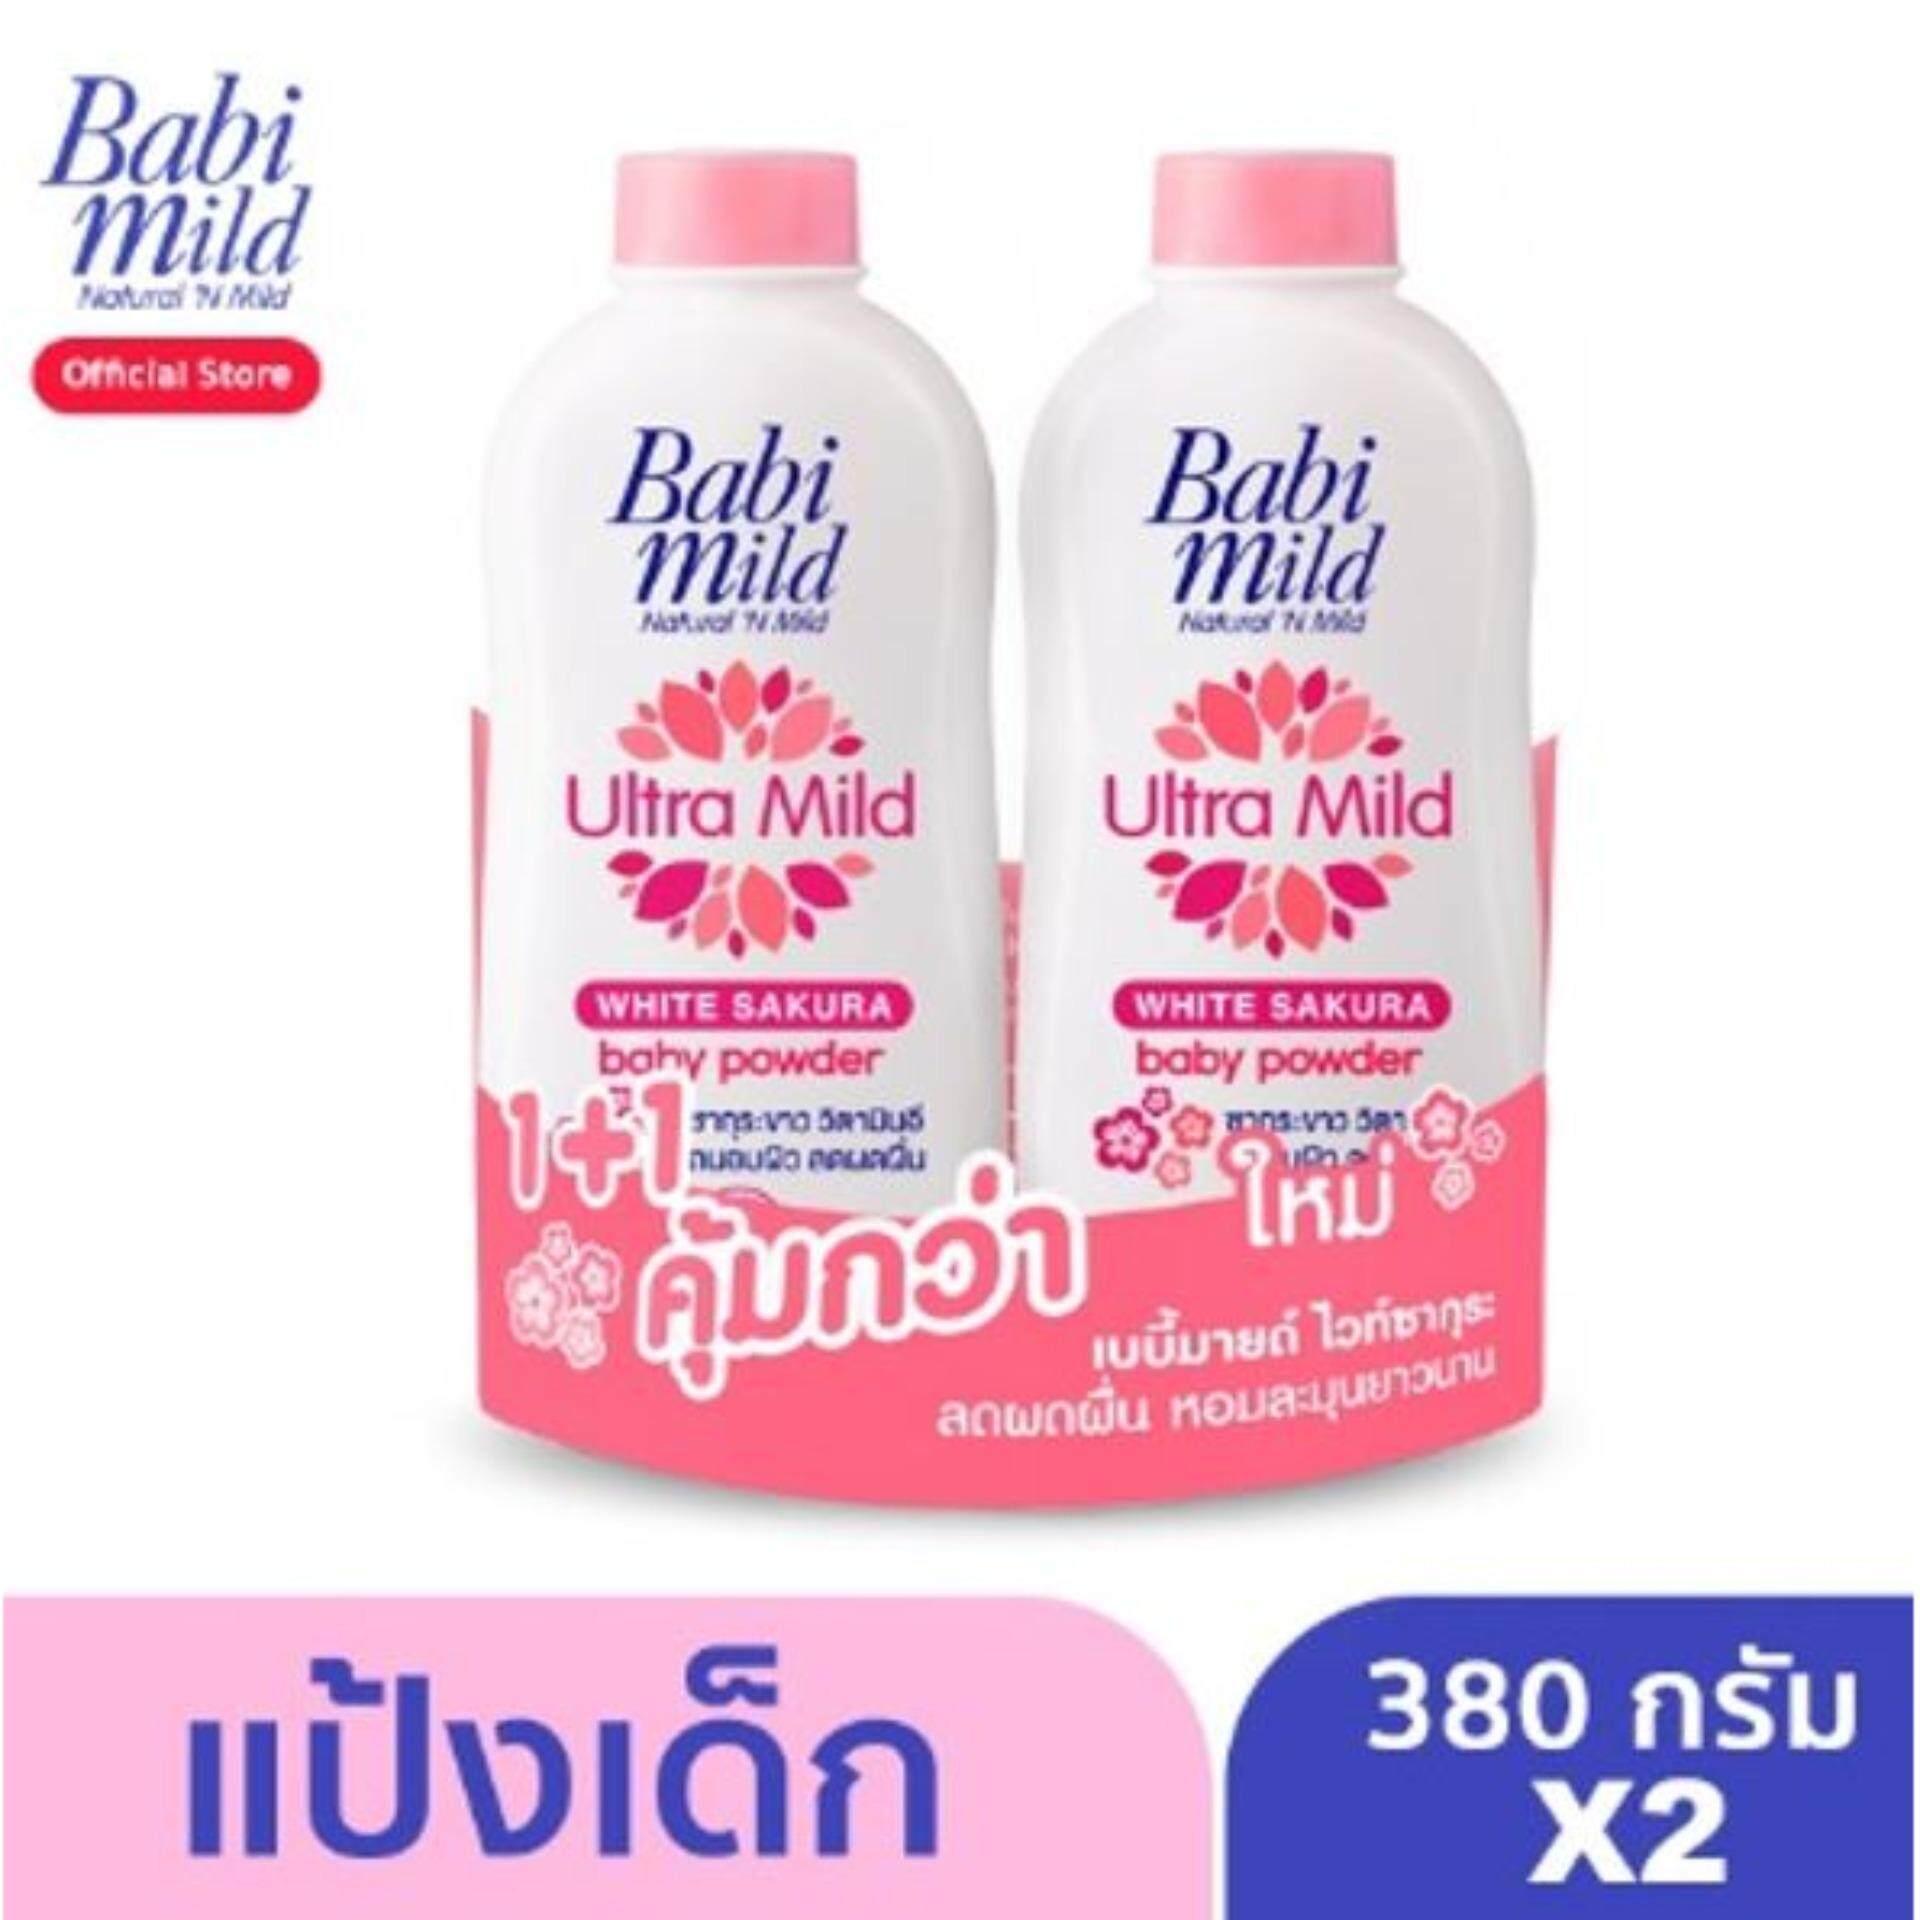 Babimild® ผลิตภัณฑ์แป้งเด็ก เบบี้มายด์ ไวท์ ซากุระ - เบบี้ พาวเดอร์ 380 กรัม (แพ็ค 2) By Babi Mild Official.